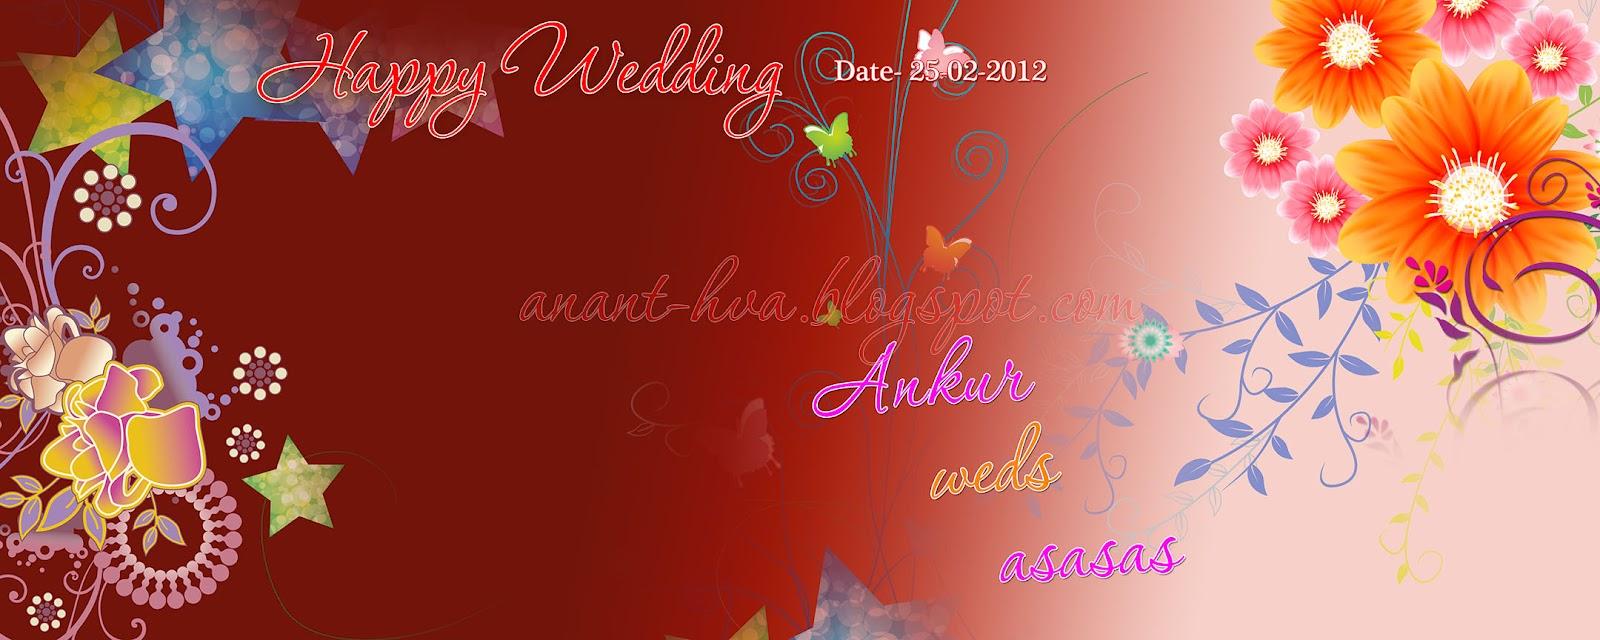 wedding album,designe, karizma album, karizma album background, Photo ...